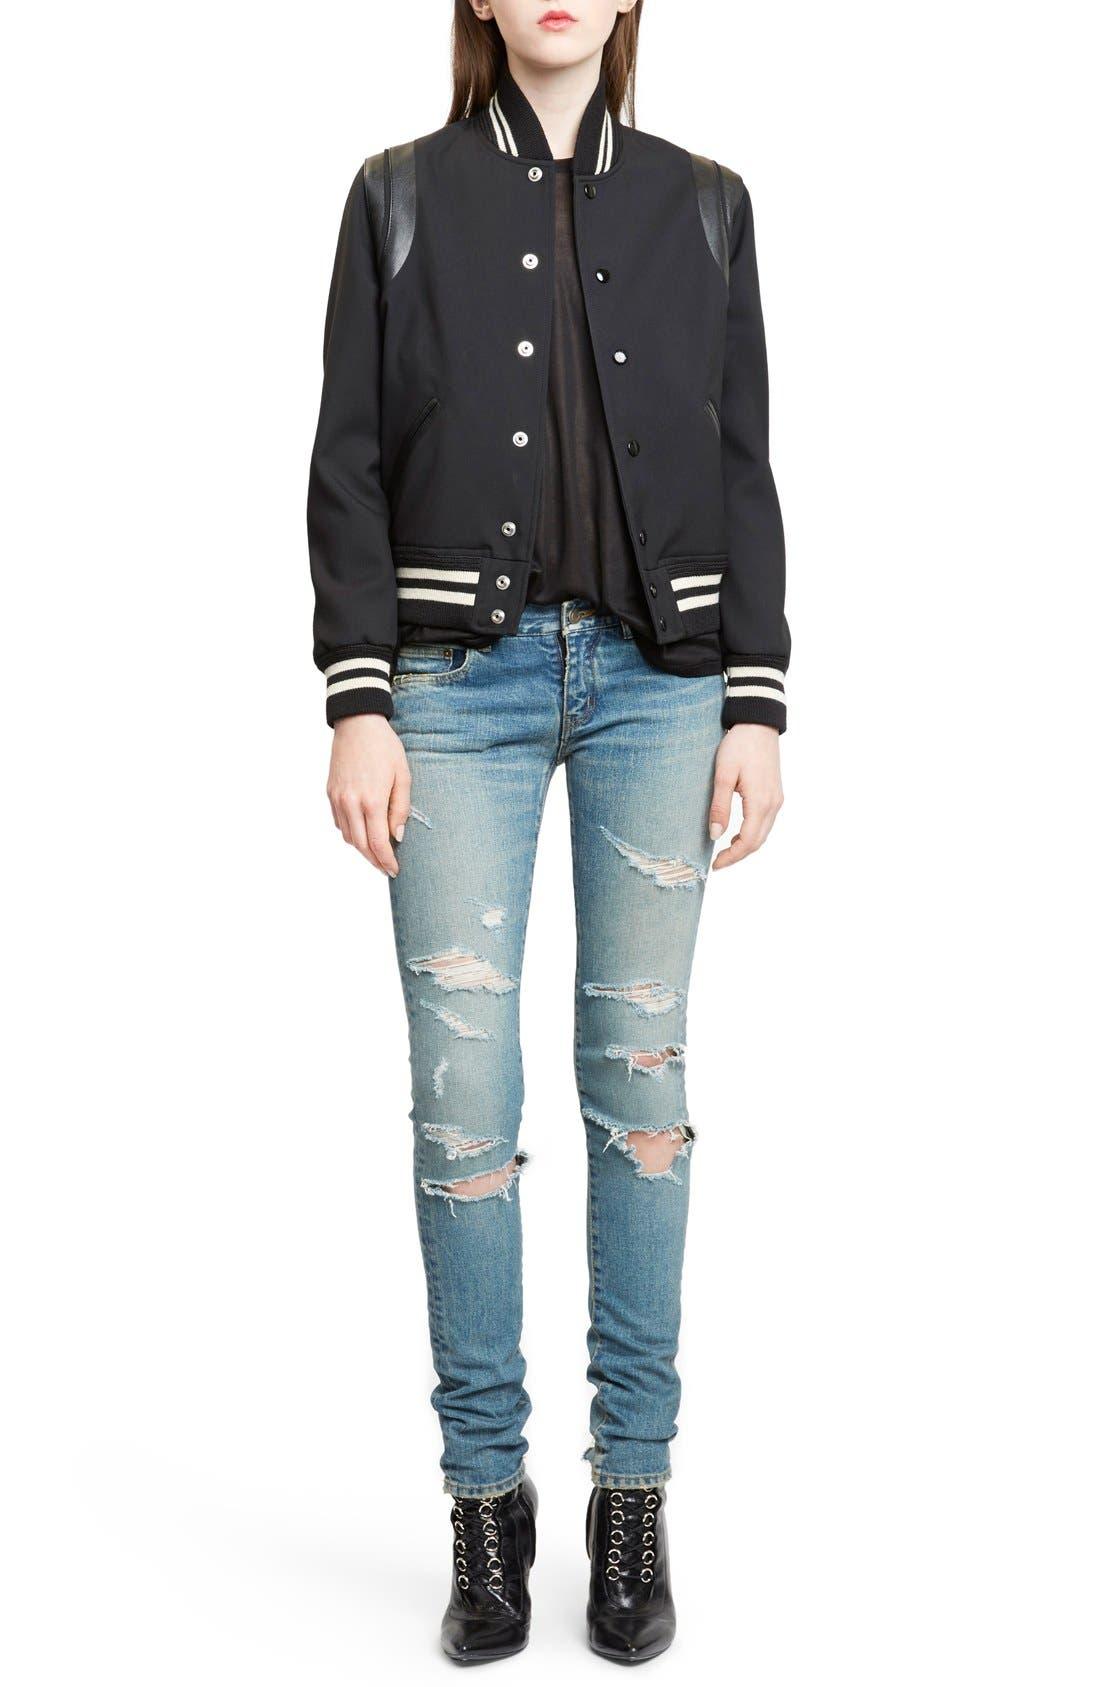 Saint Laurent 'Teddy' Black Leather Trim Bomber Jacket